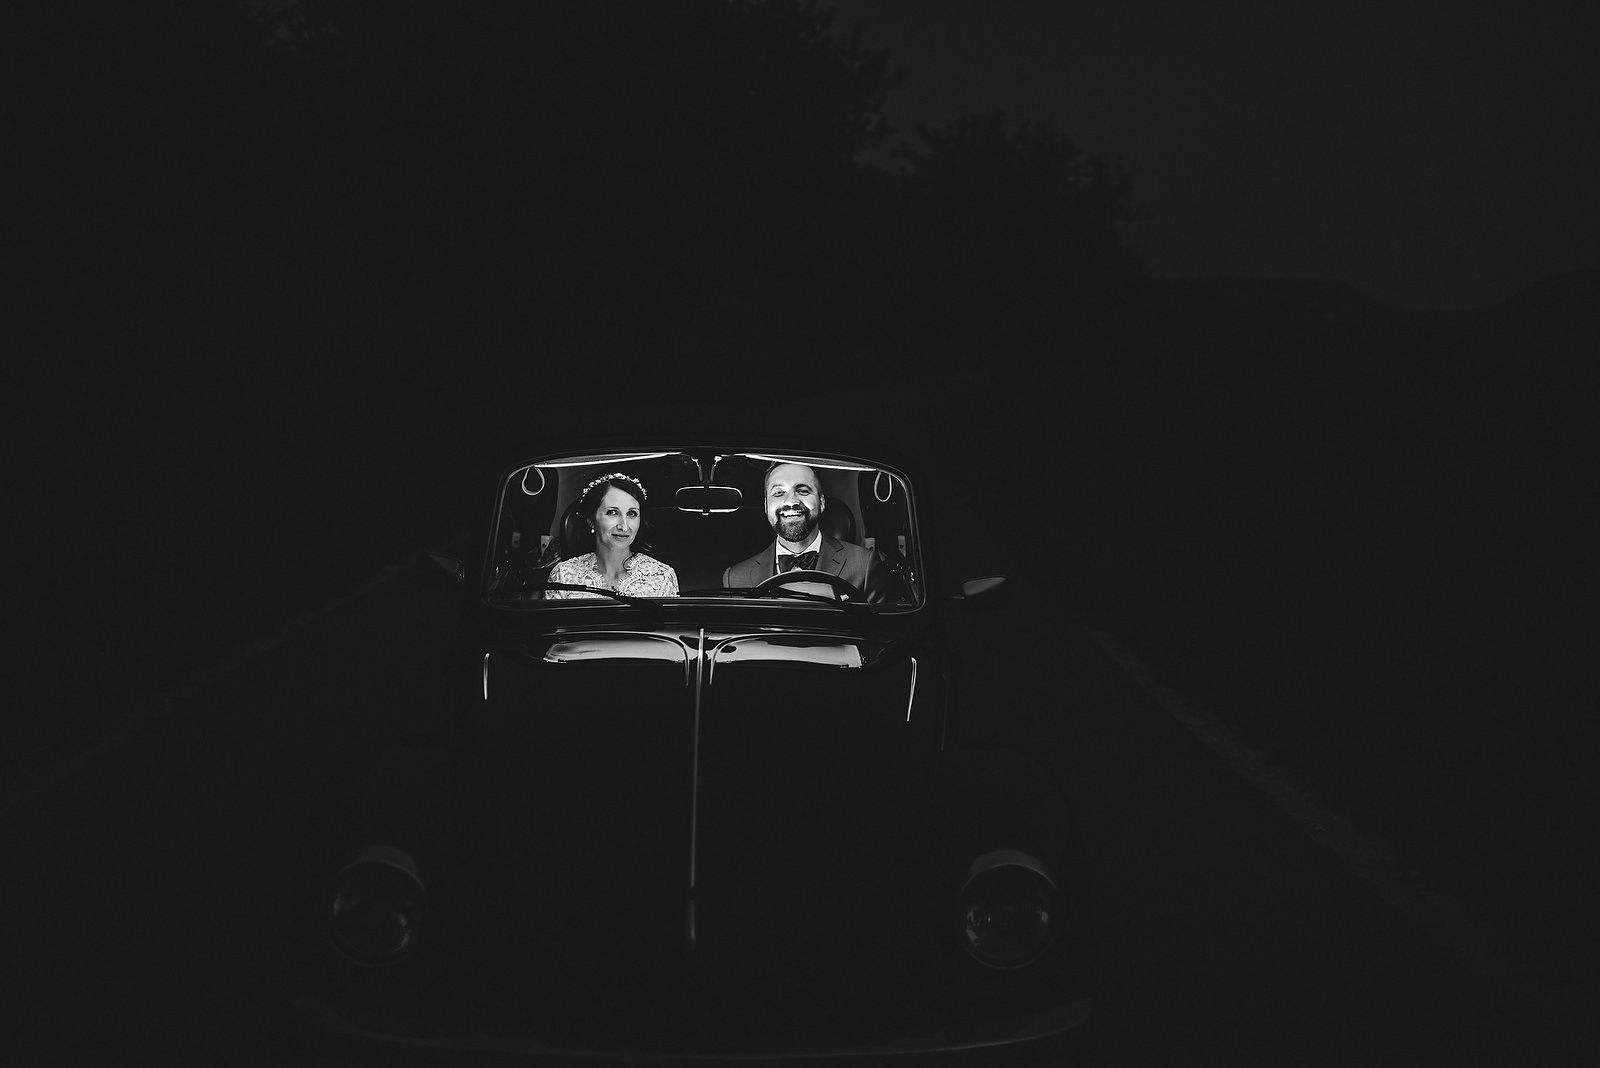 Fotograf Konstanz - Hochzeitsfotograf Reutlingen Achalm Hochzeit EFP 88 - Als Hochzeitsfotograf auf der Achalm, Reutlingen  - 74 -